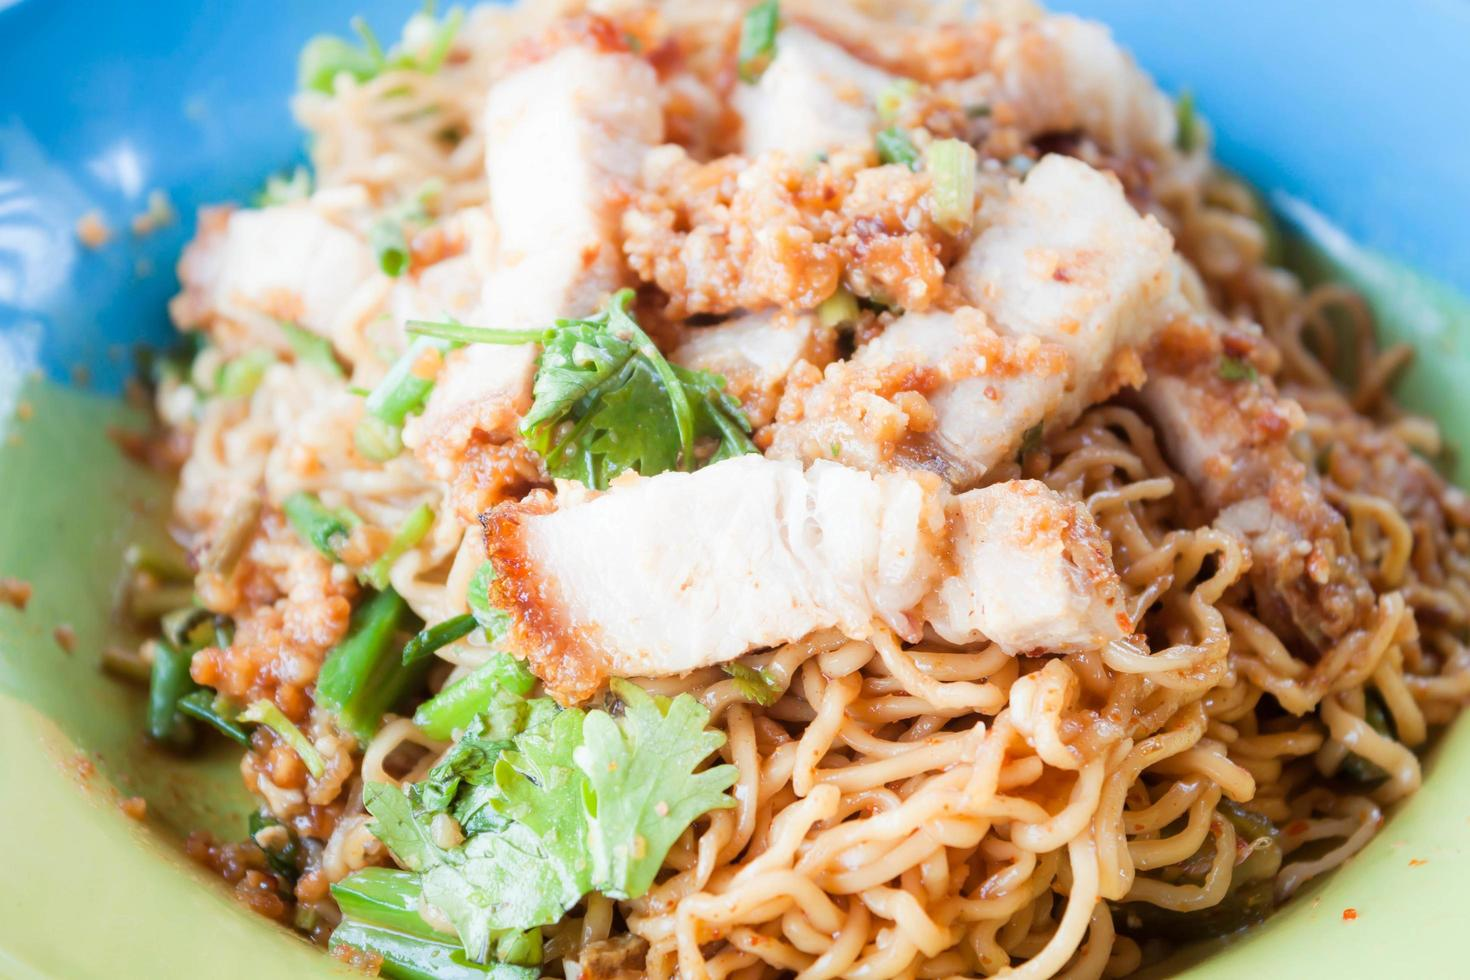 Pork stir fry spicy noodle dish photo